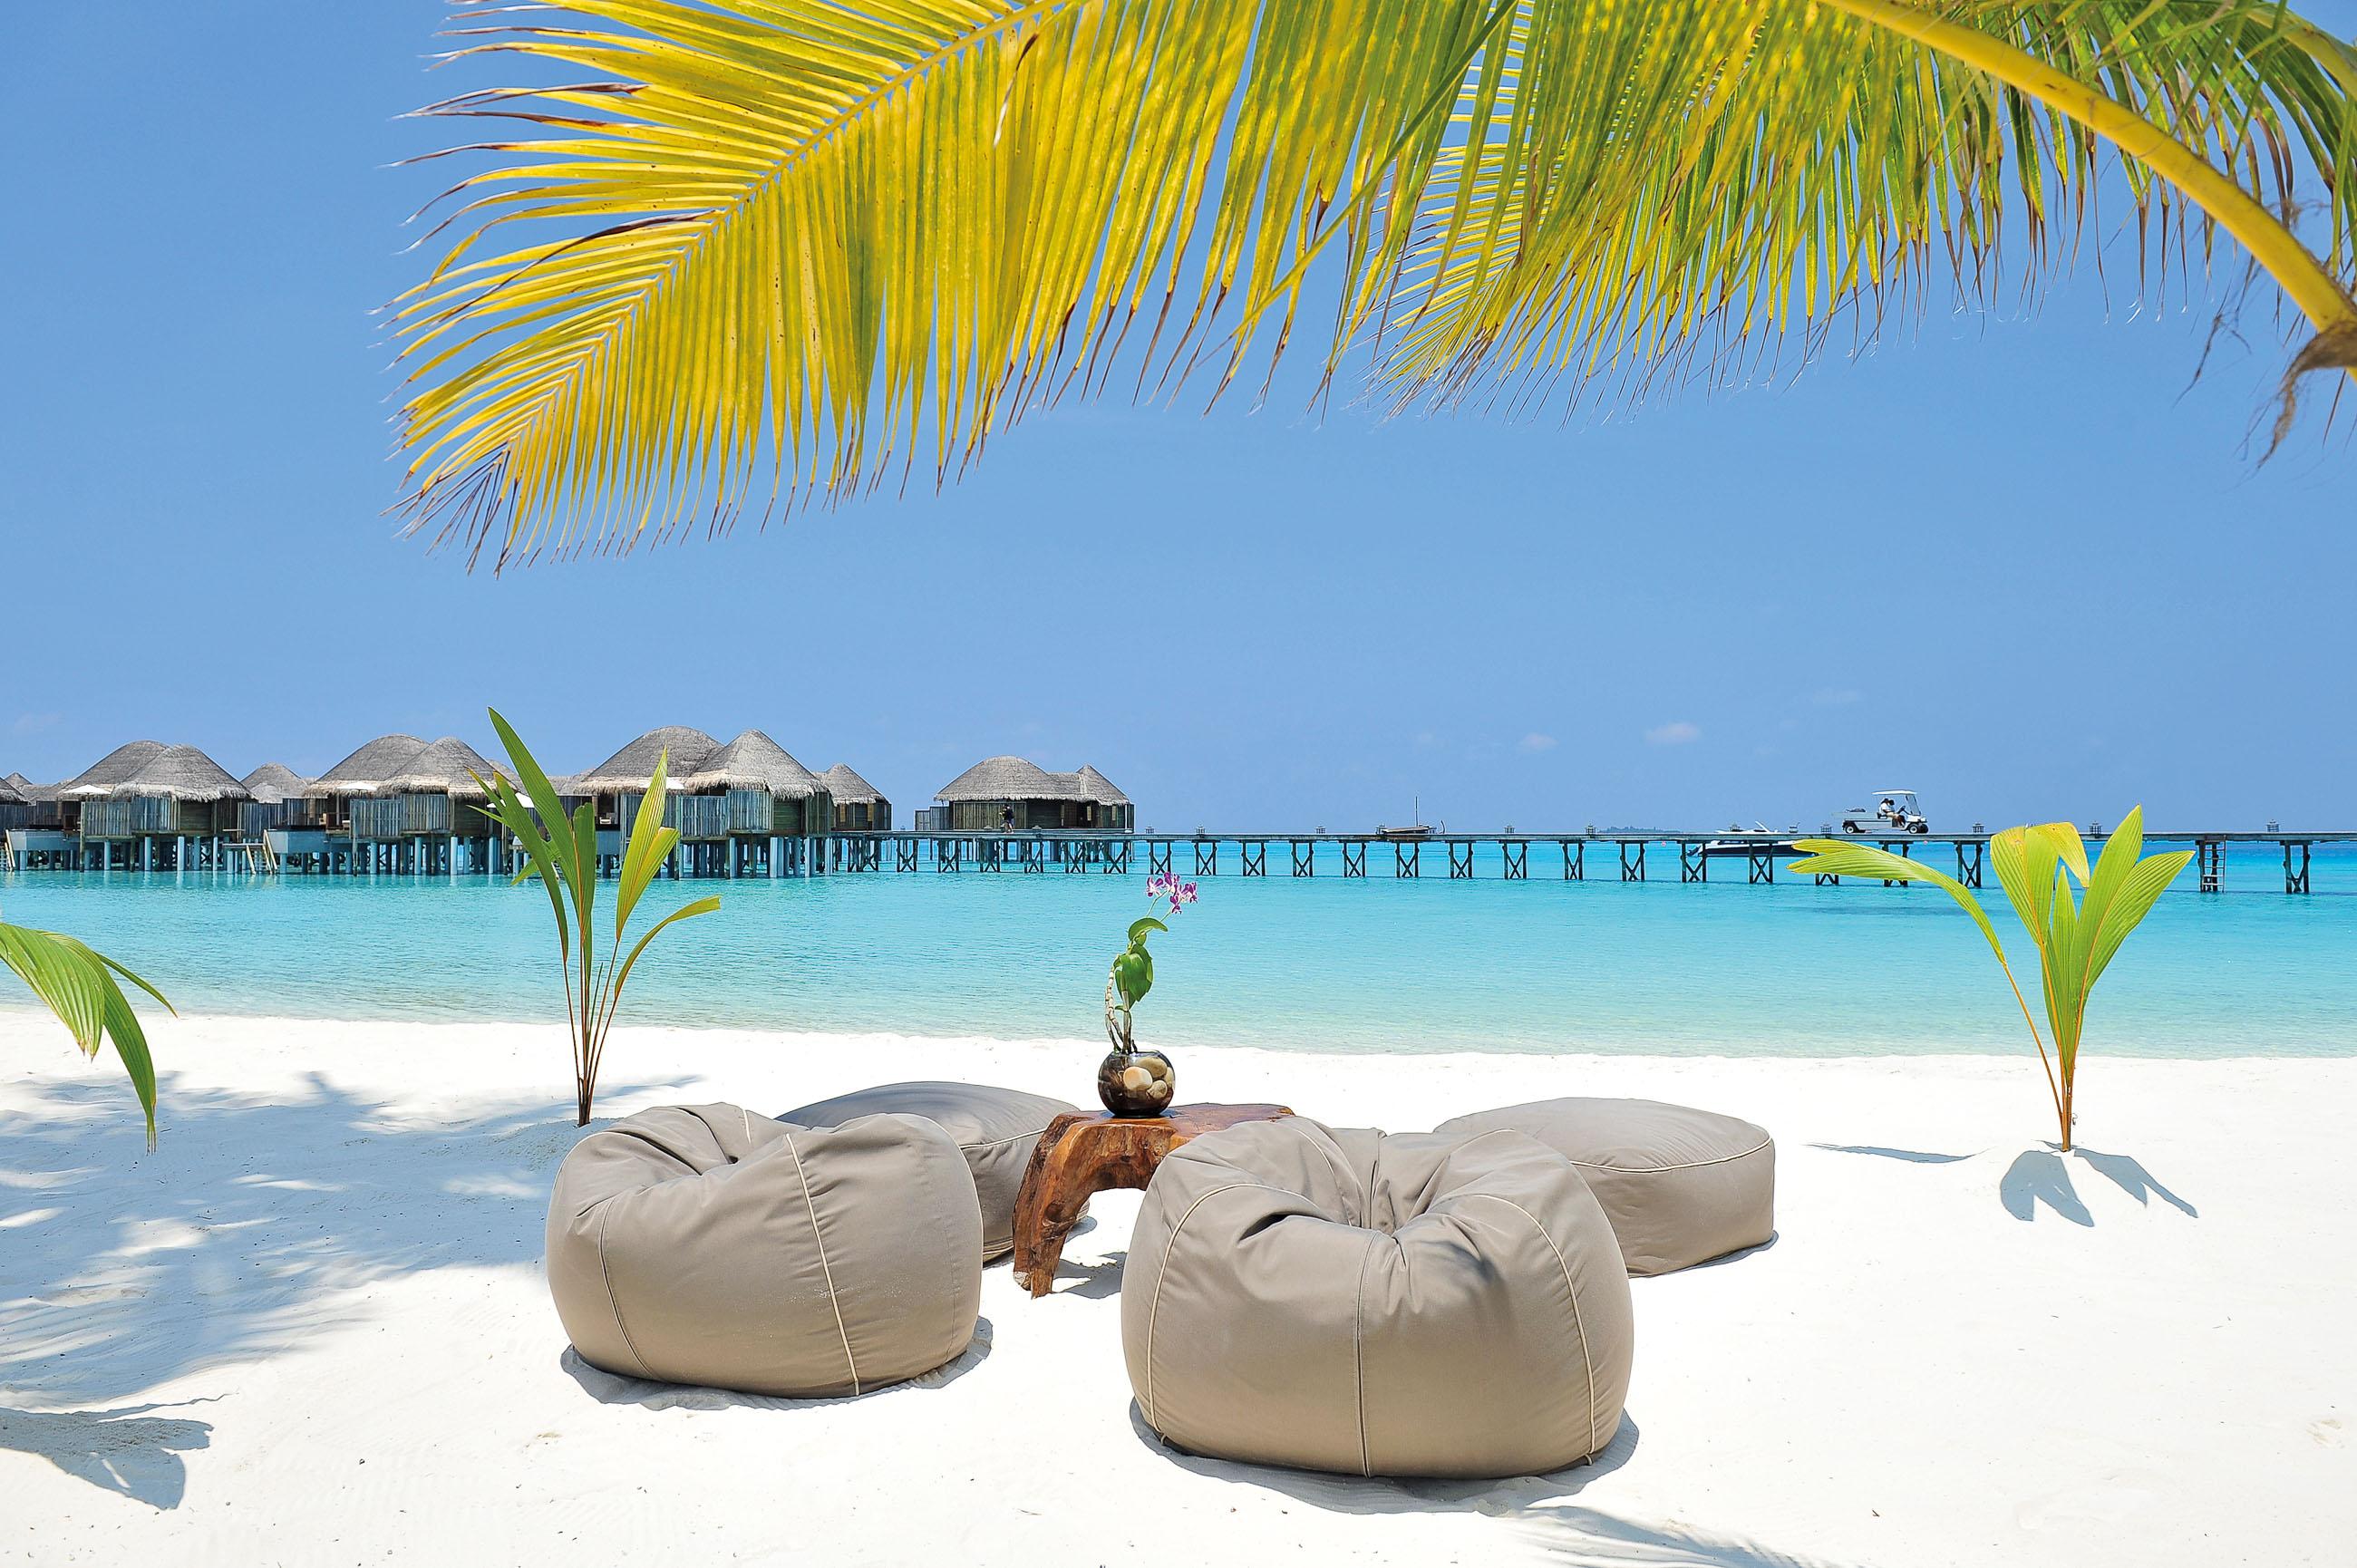 https://bubo.sk/uploads/galleries/16372/halaveli-maldives-sandy-beach-4_hd-26.jpg